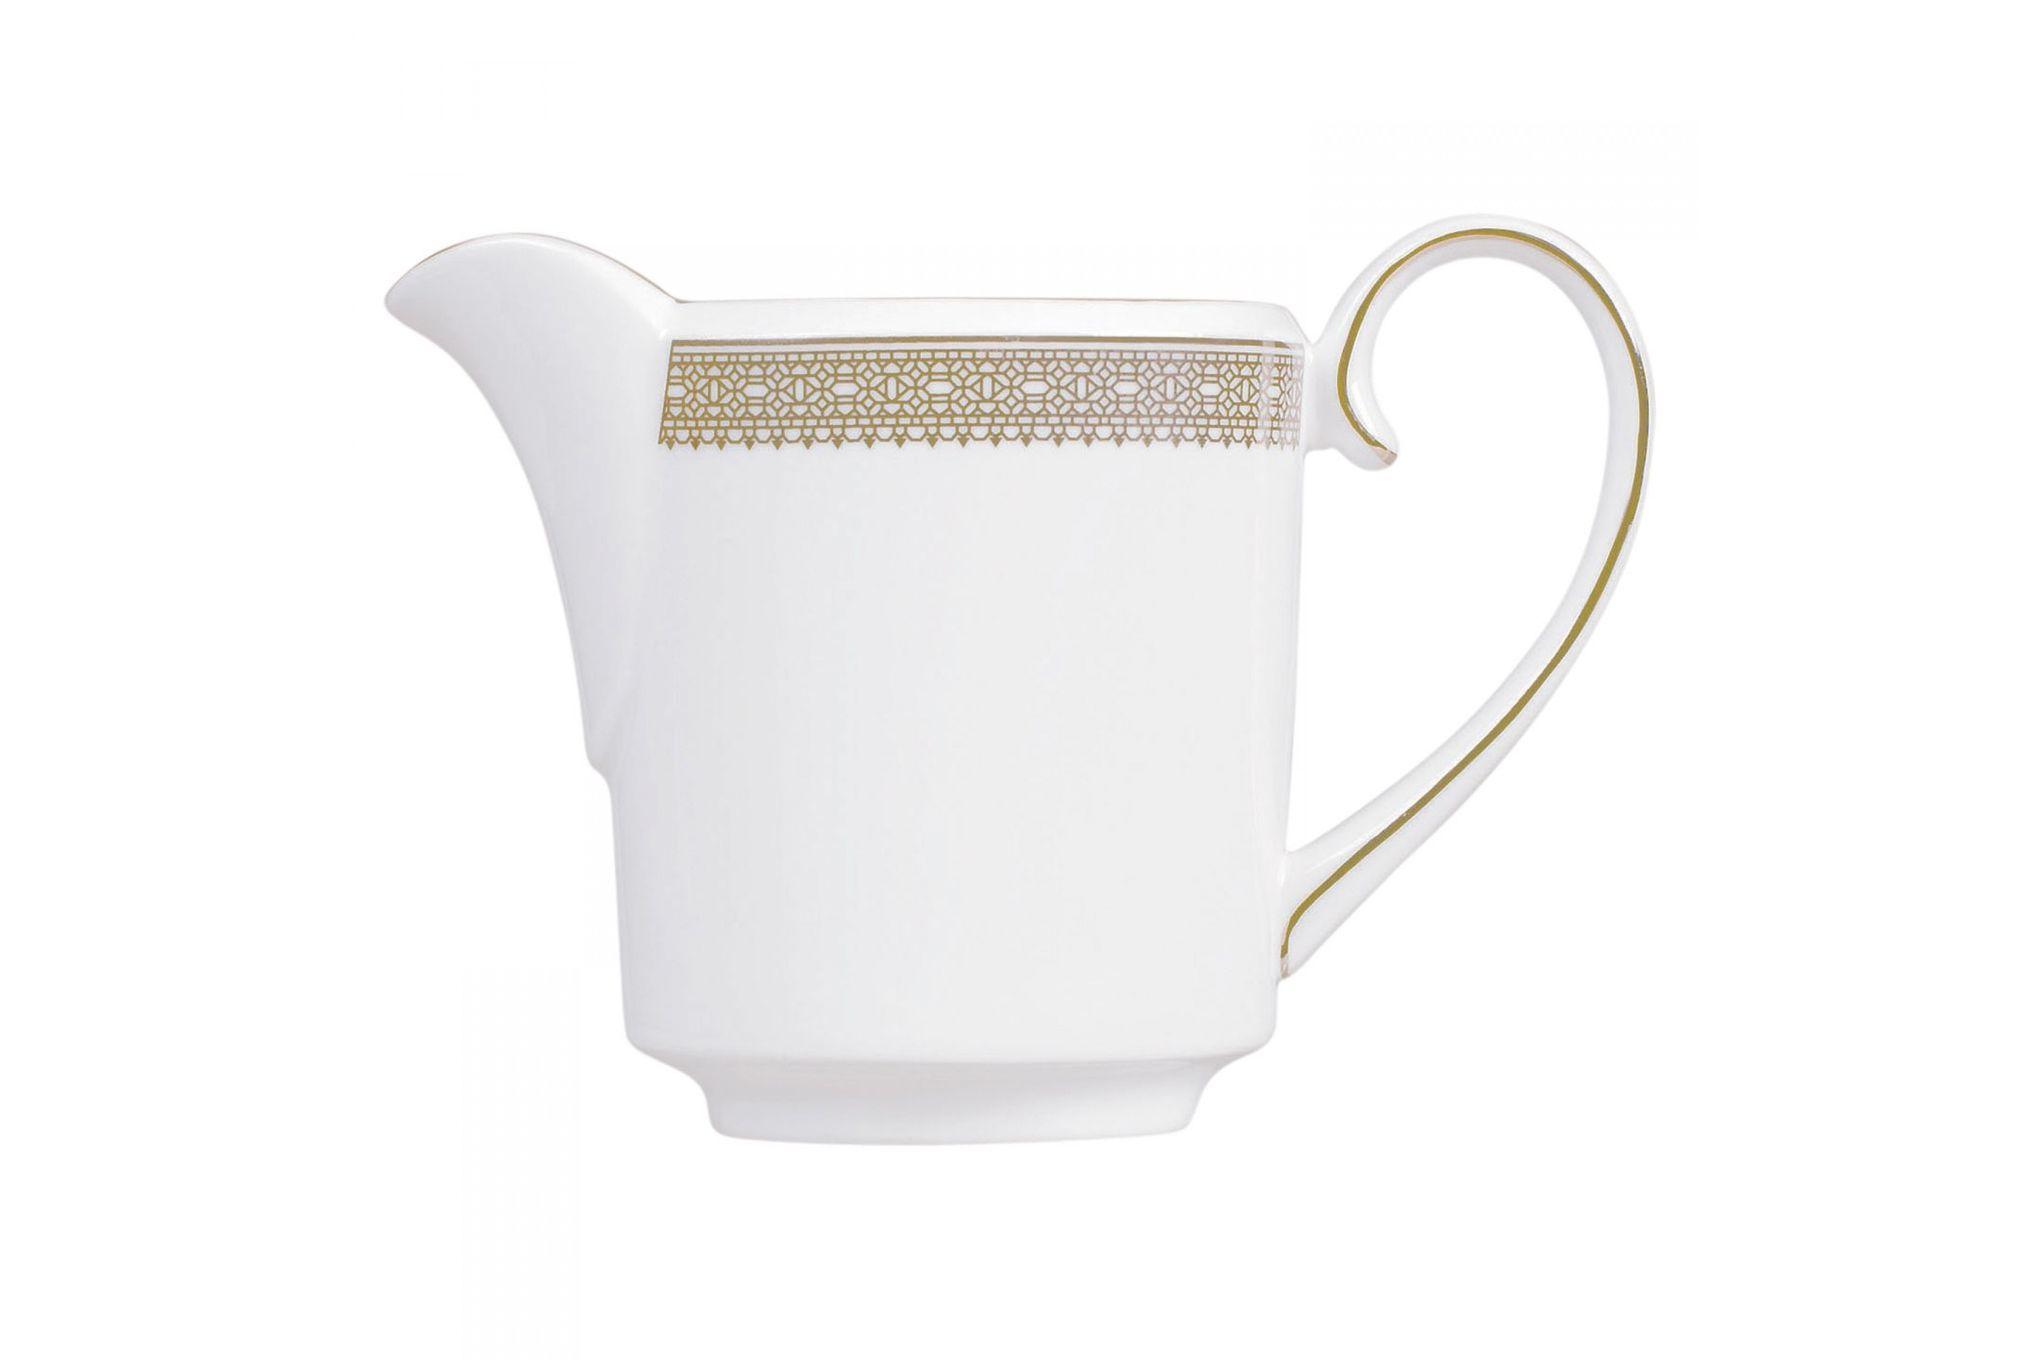 Vera Wang for Wedgwood Lace Gold Milk Jug 0.23l thumb 2